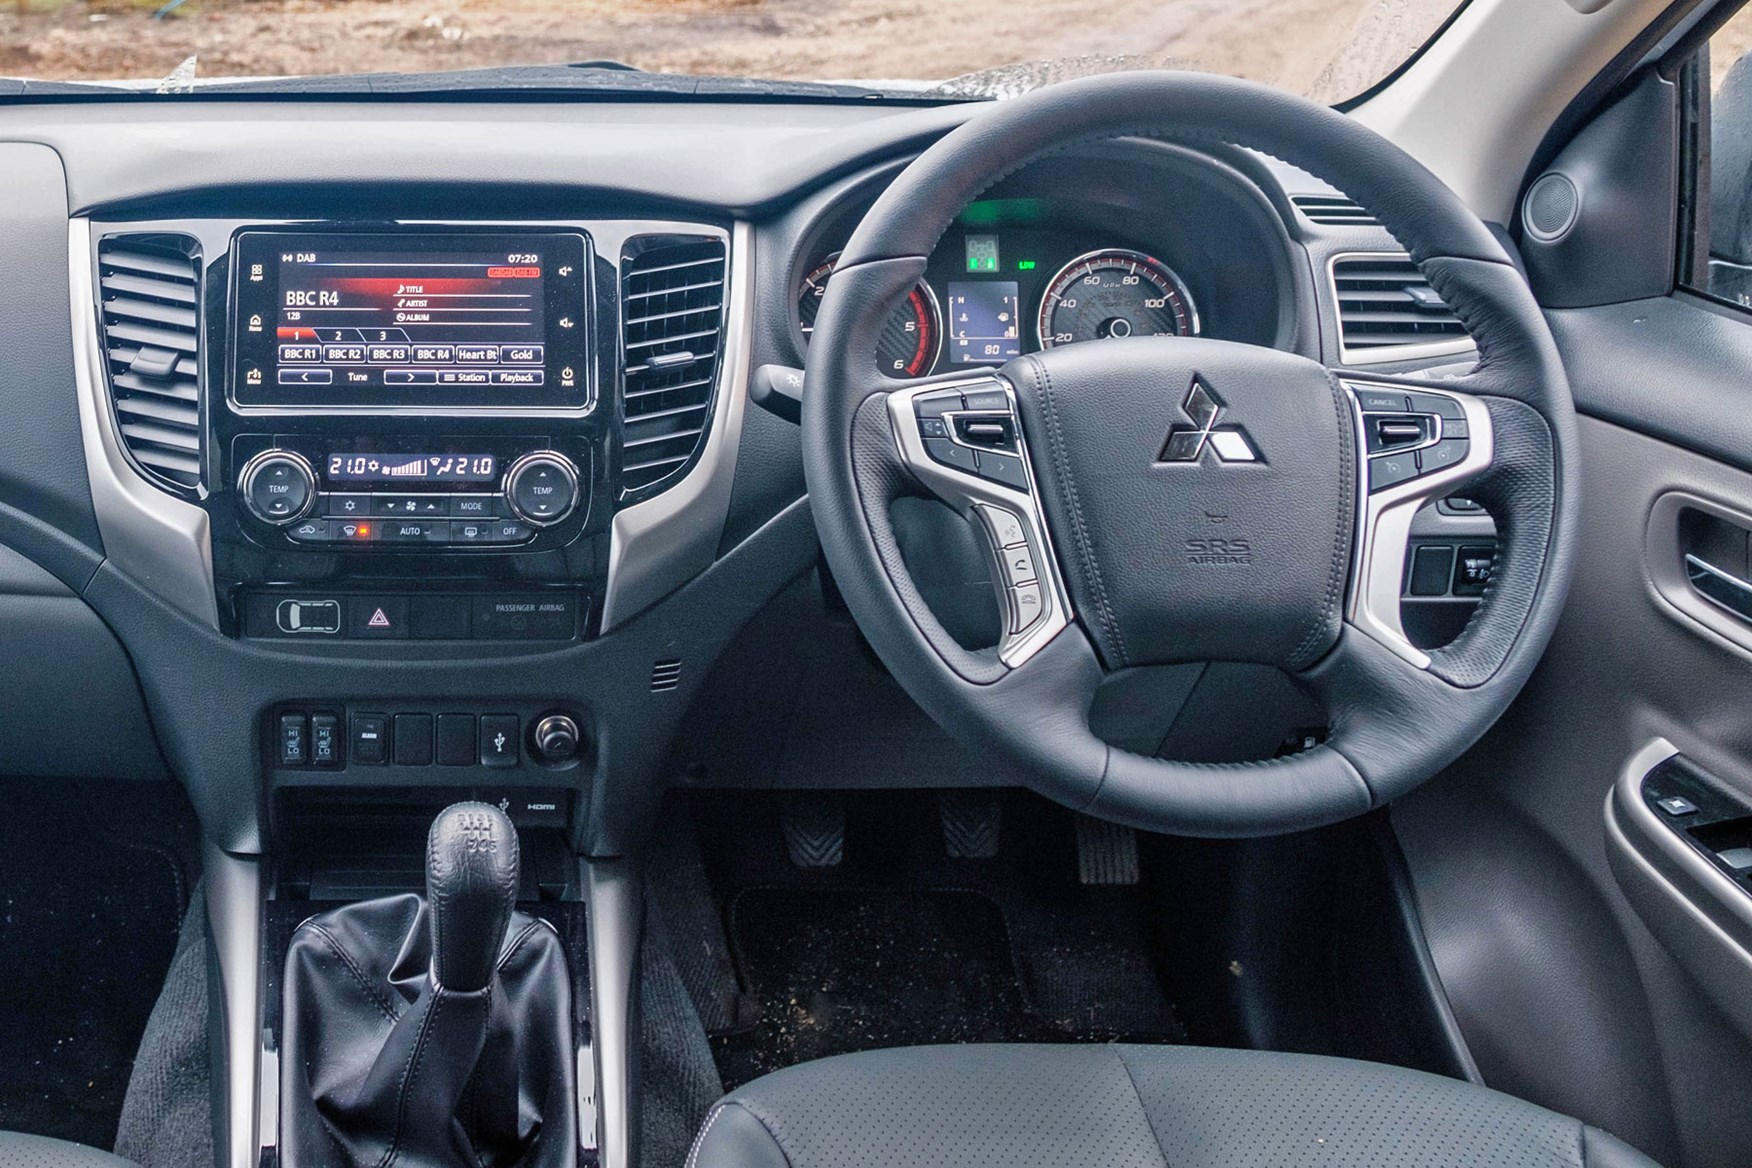 Mitsubishi L200, dashboard, cab interior, SDA multimedia infotainment system